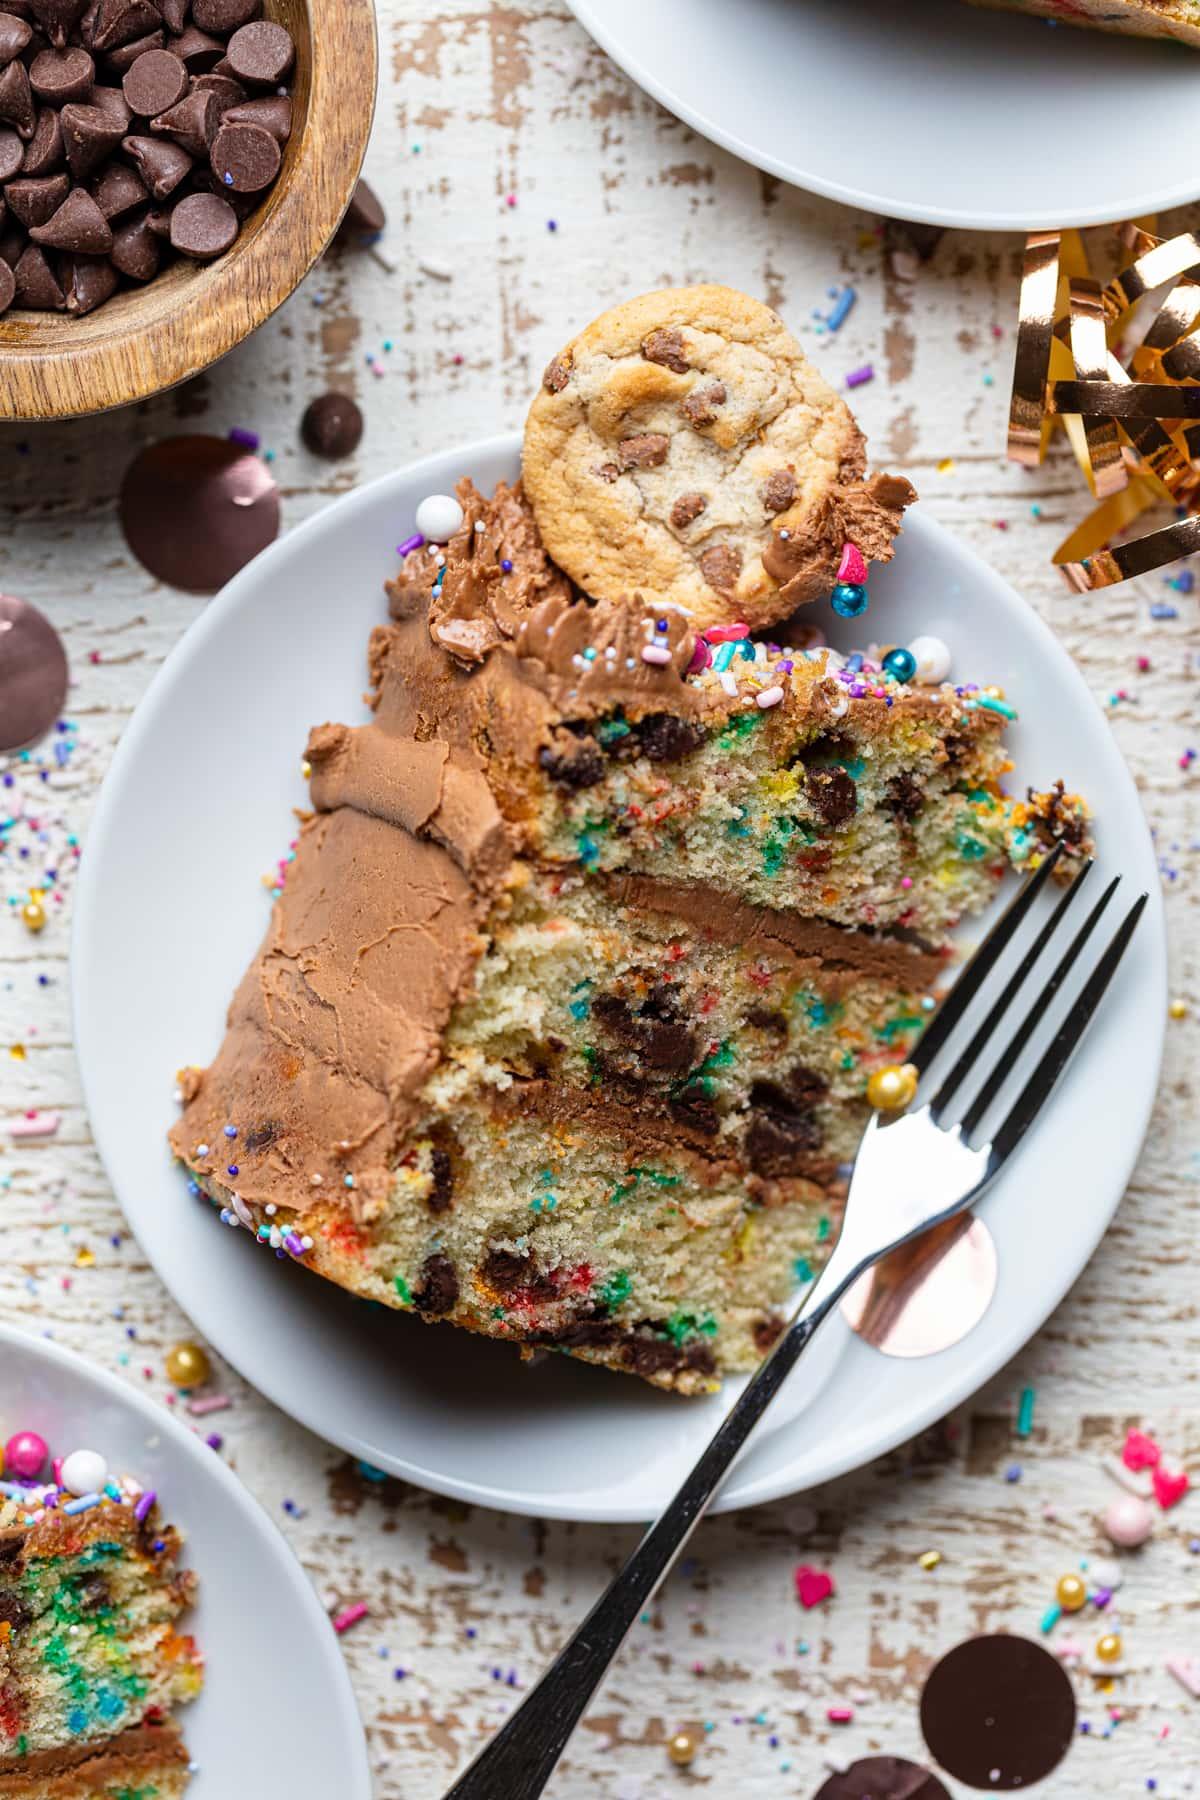 Confetti Chocolate Chip Cake